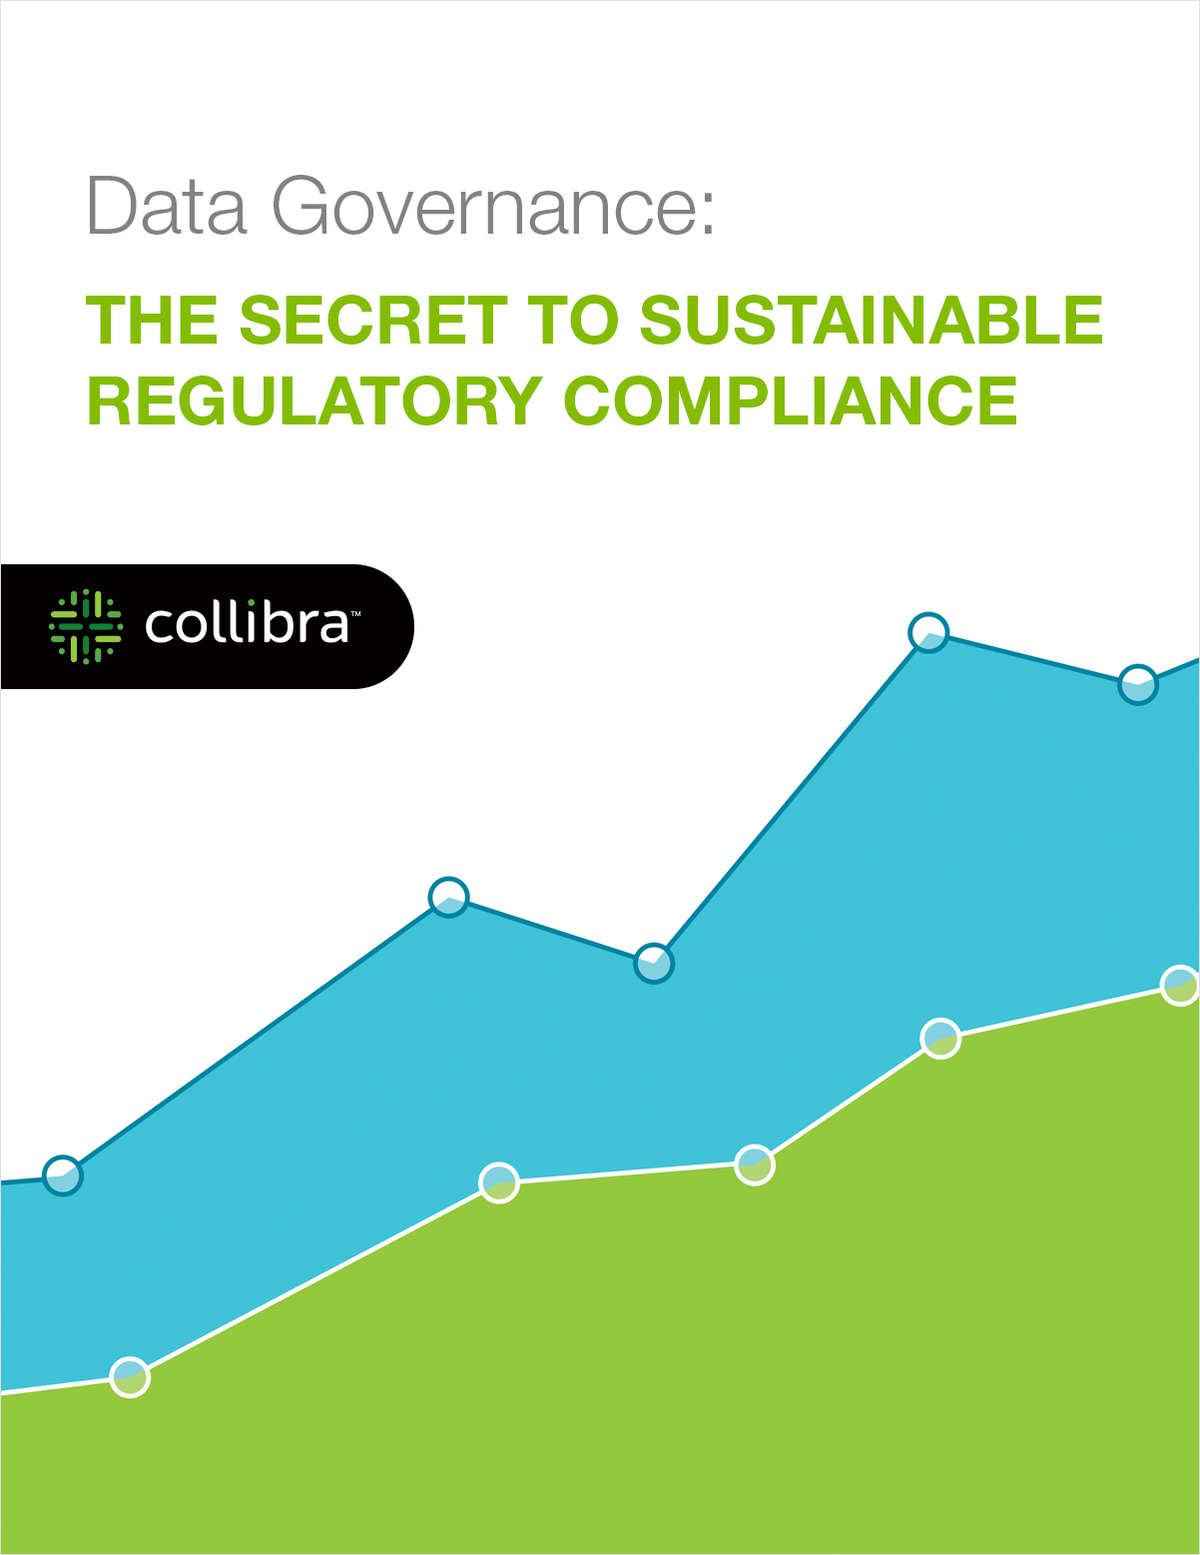 Data Governance: The Secret to Sustainable Regulatory Compliance